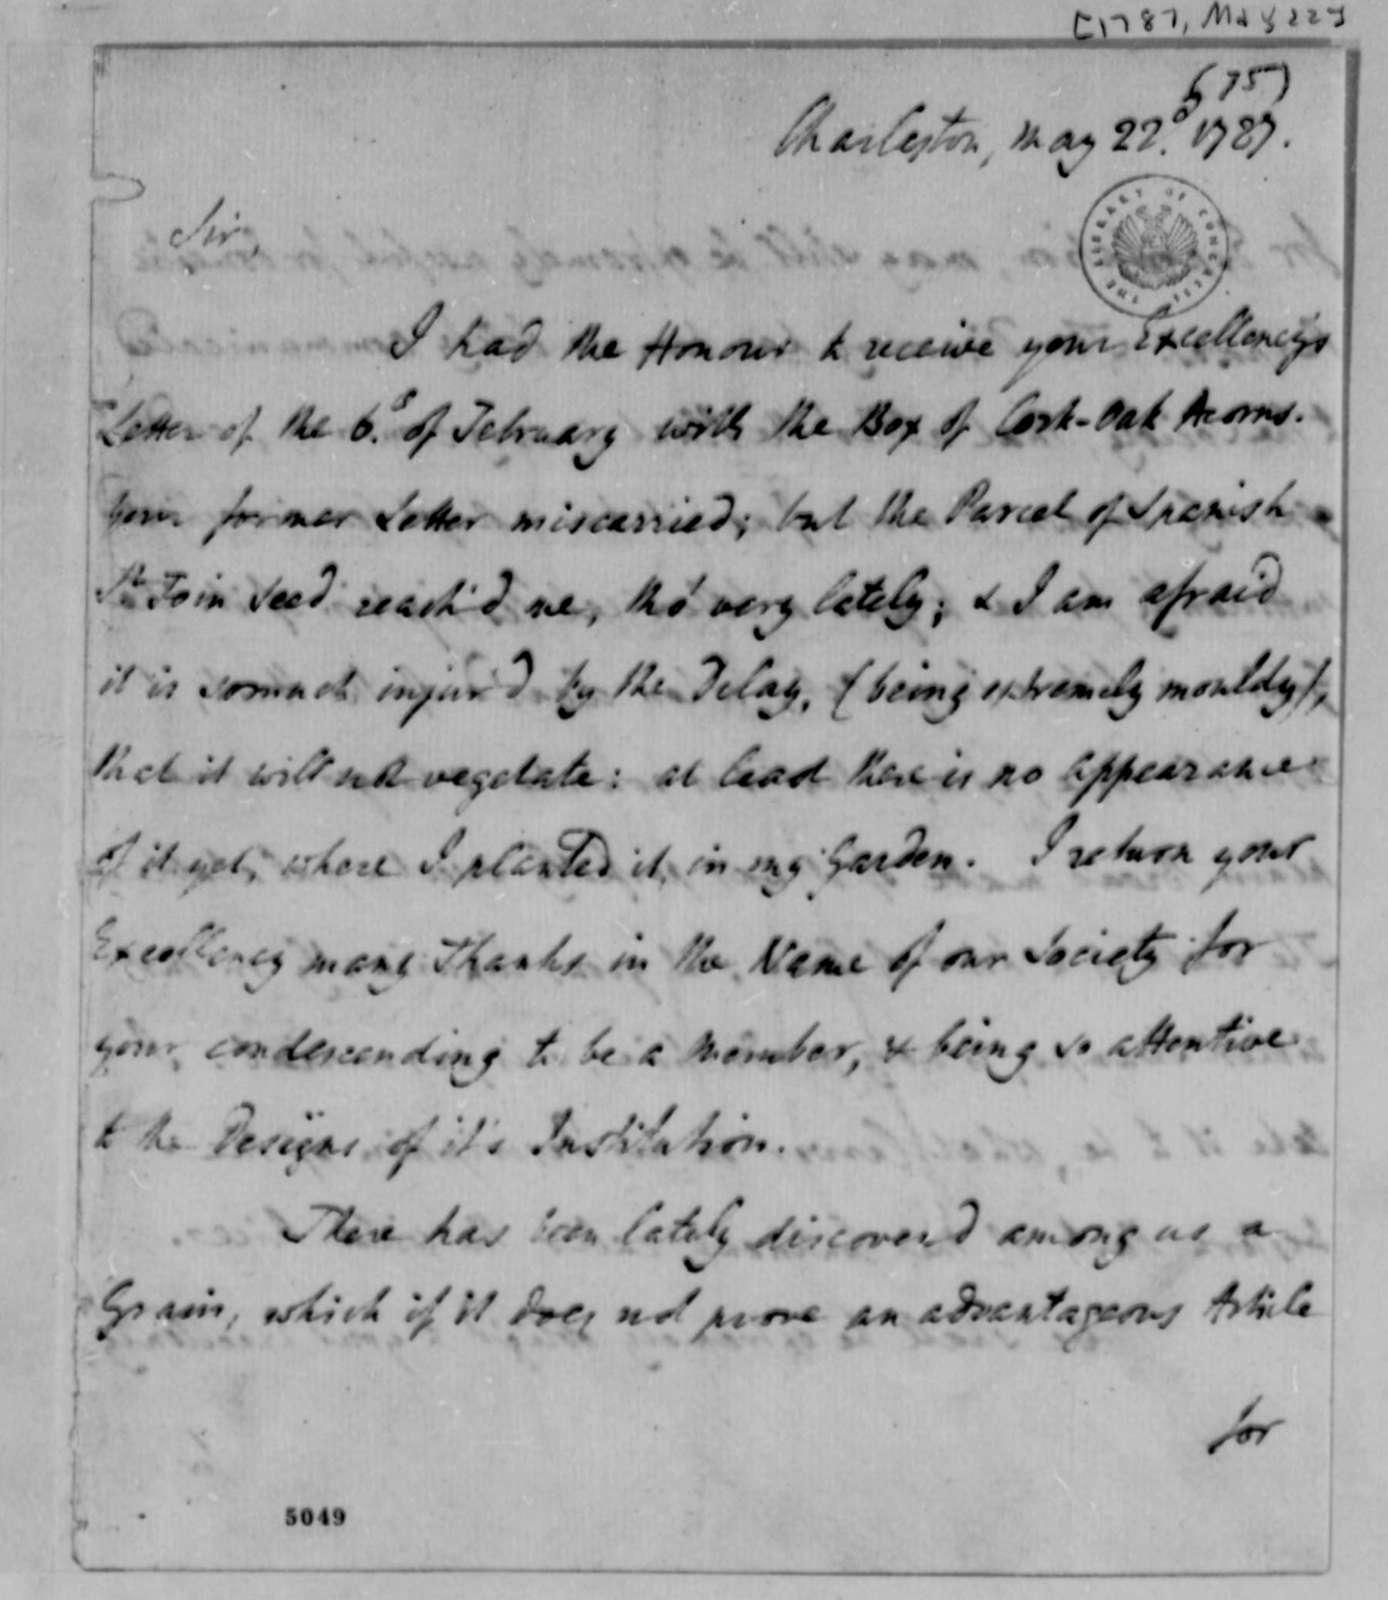 William Drayton to Thomas Jefferson, May 22, 1787